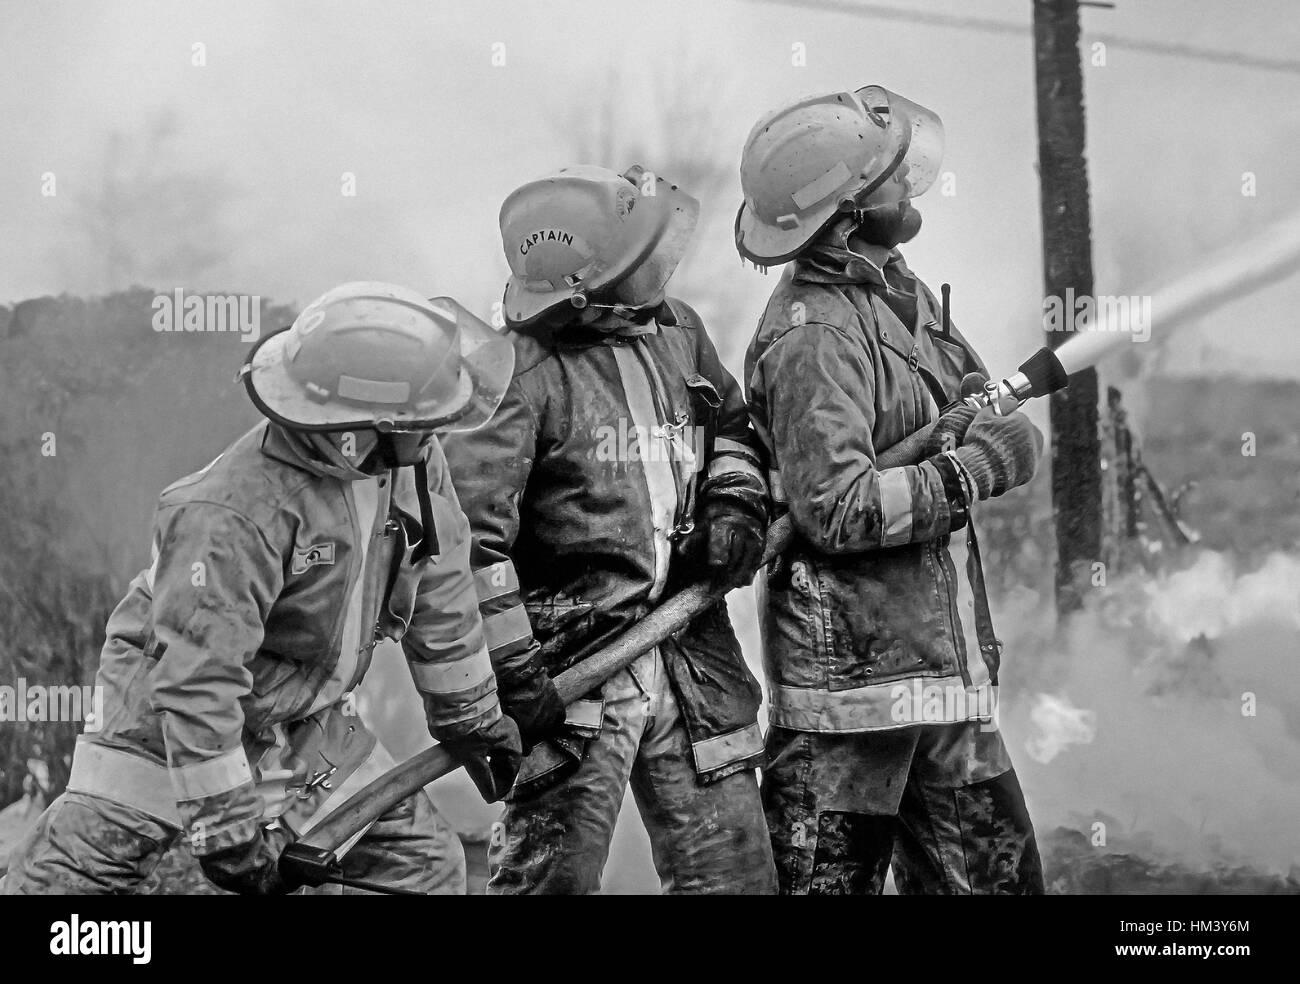 Three firefighters battle a blaze. - Stock Image